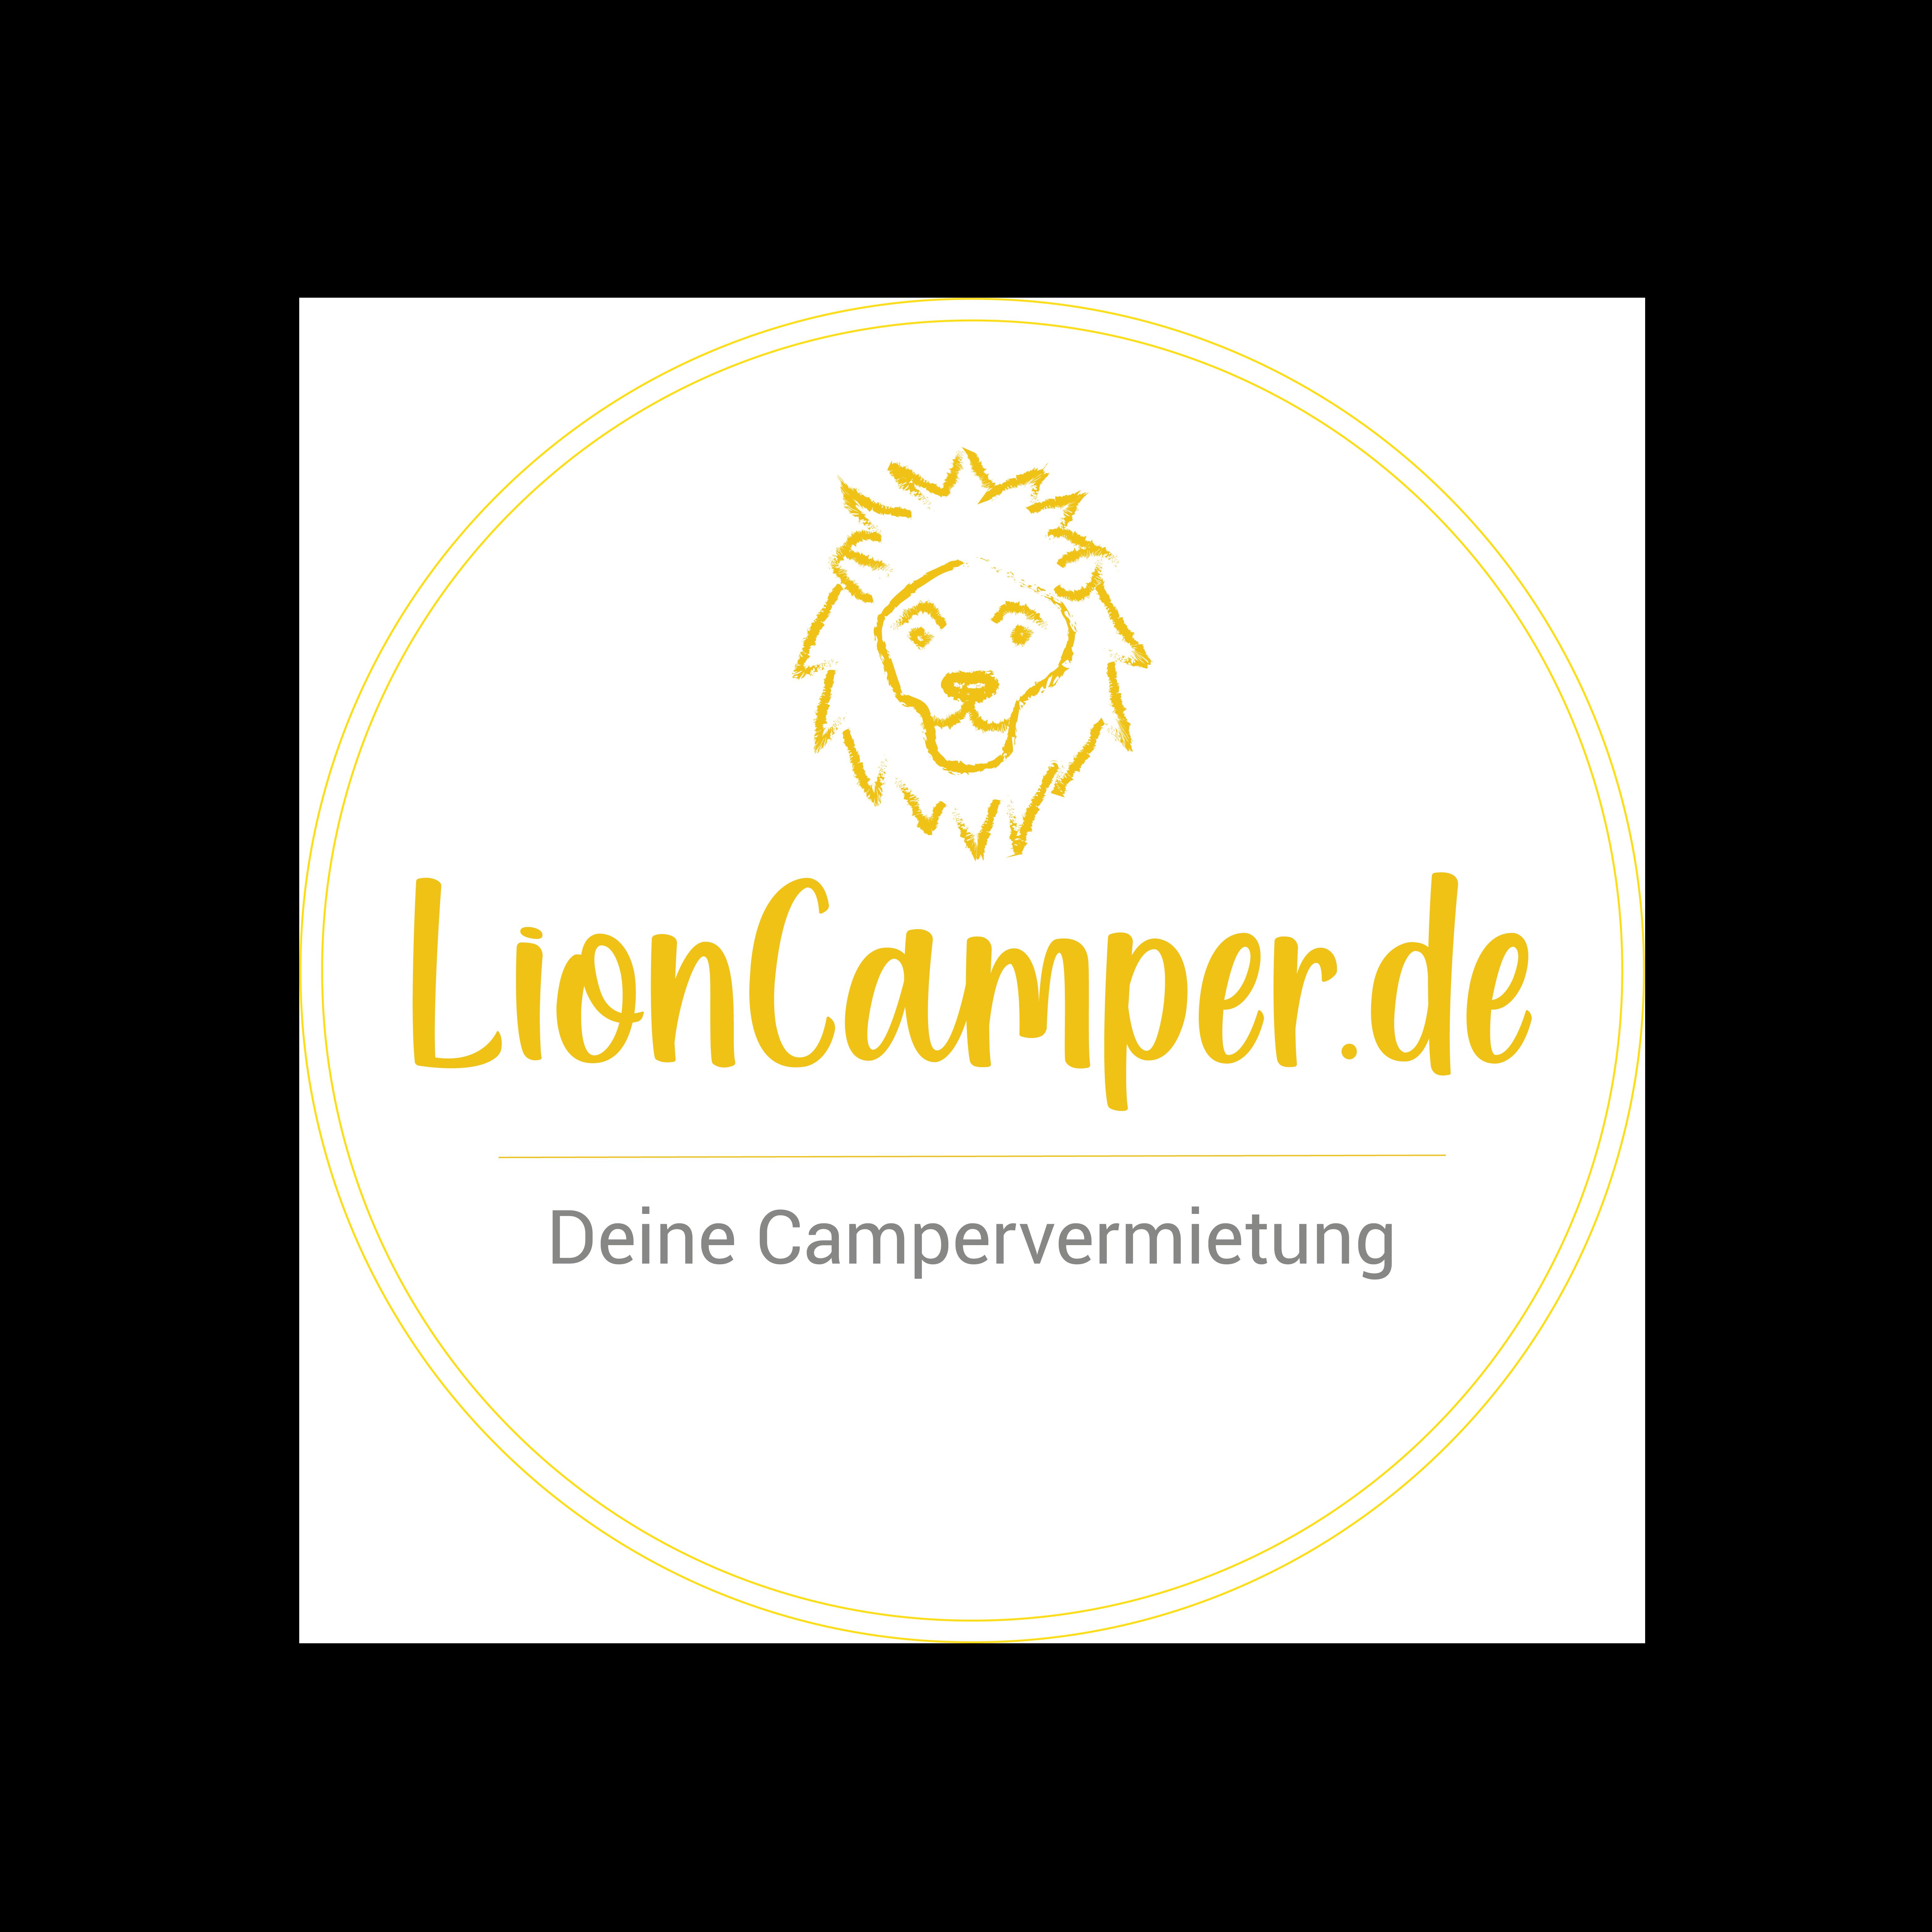 LionCamper GmbH